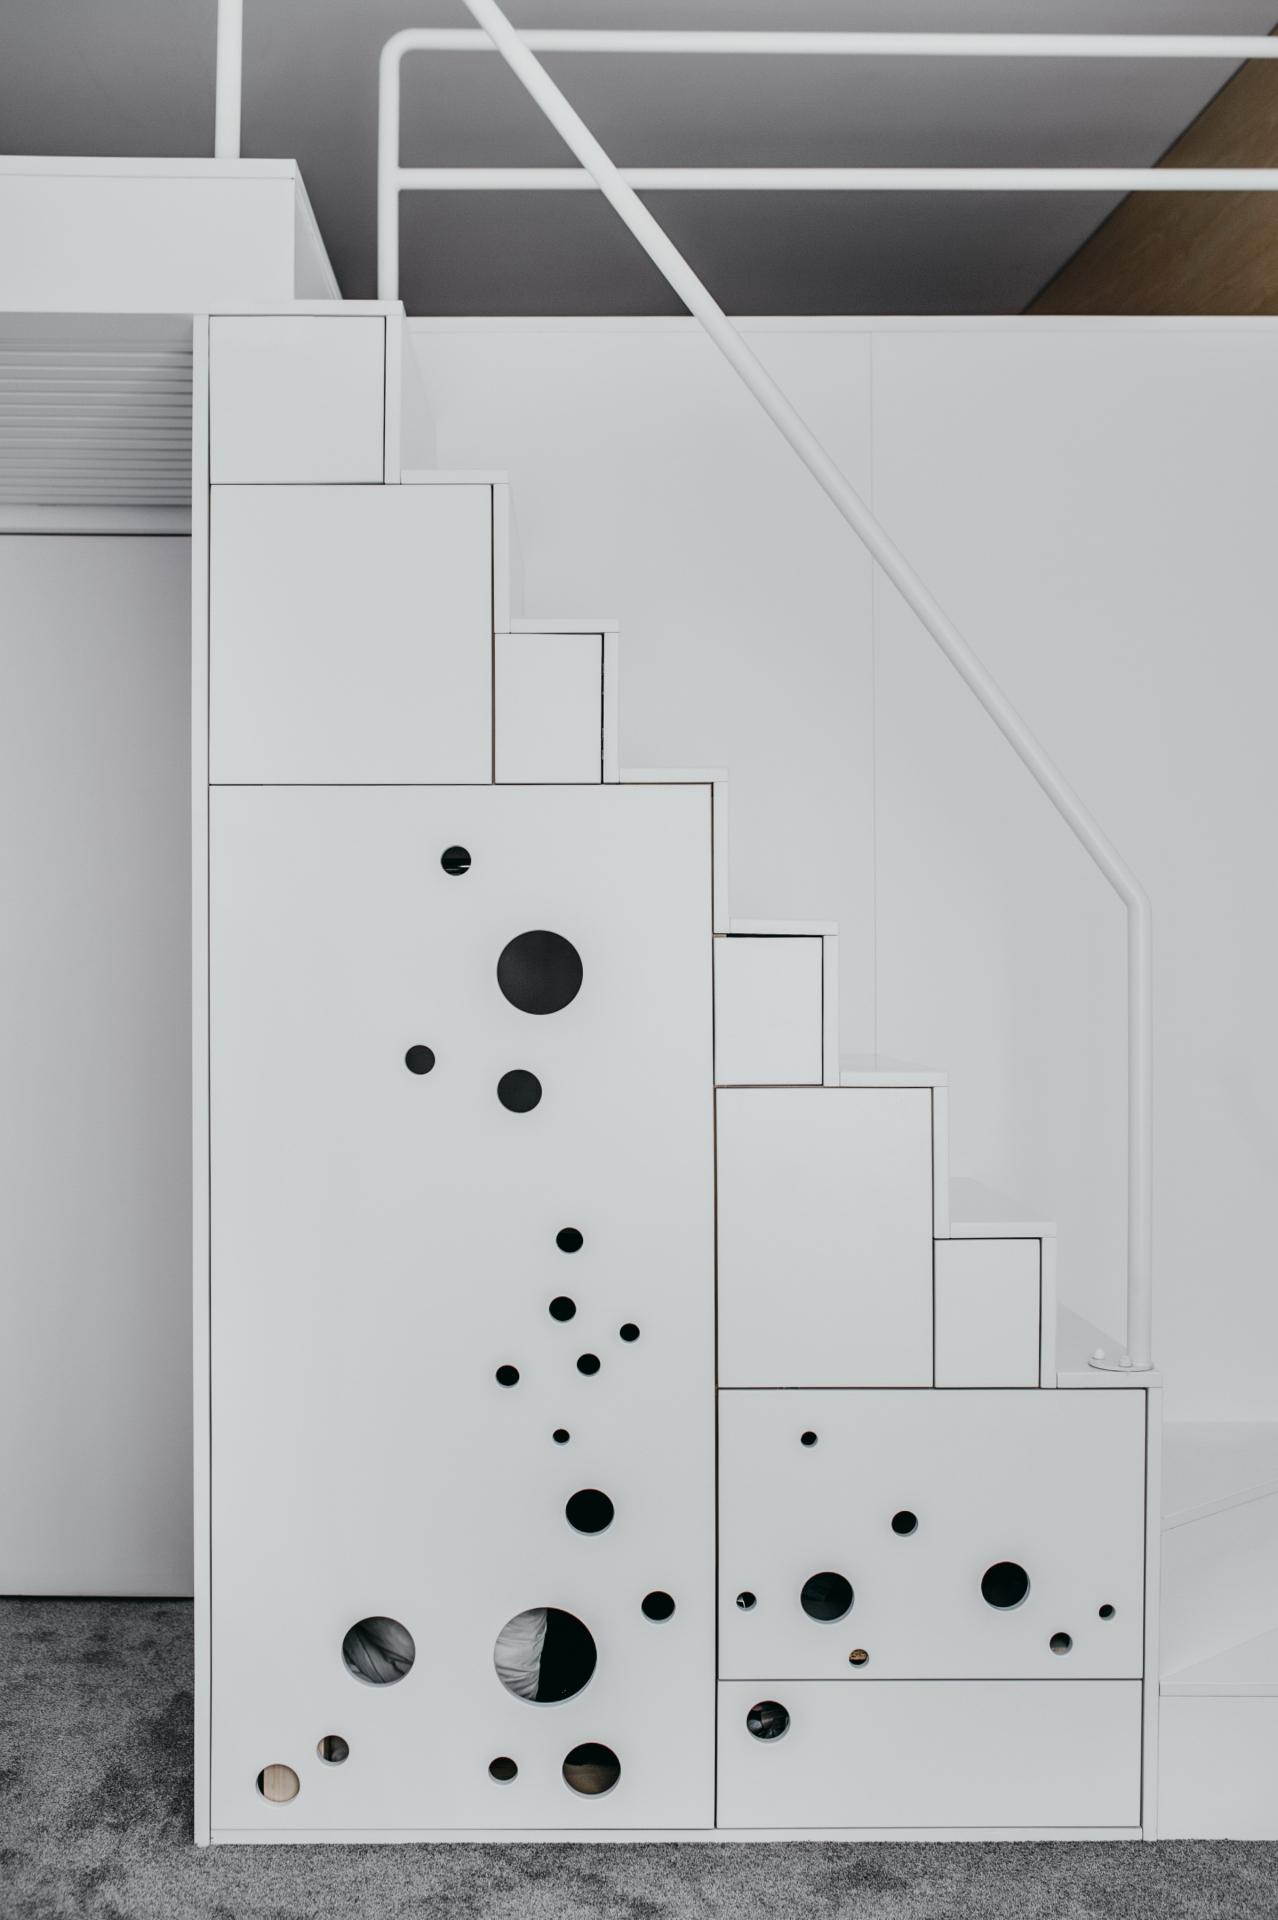 mus_architects_designalive-8